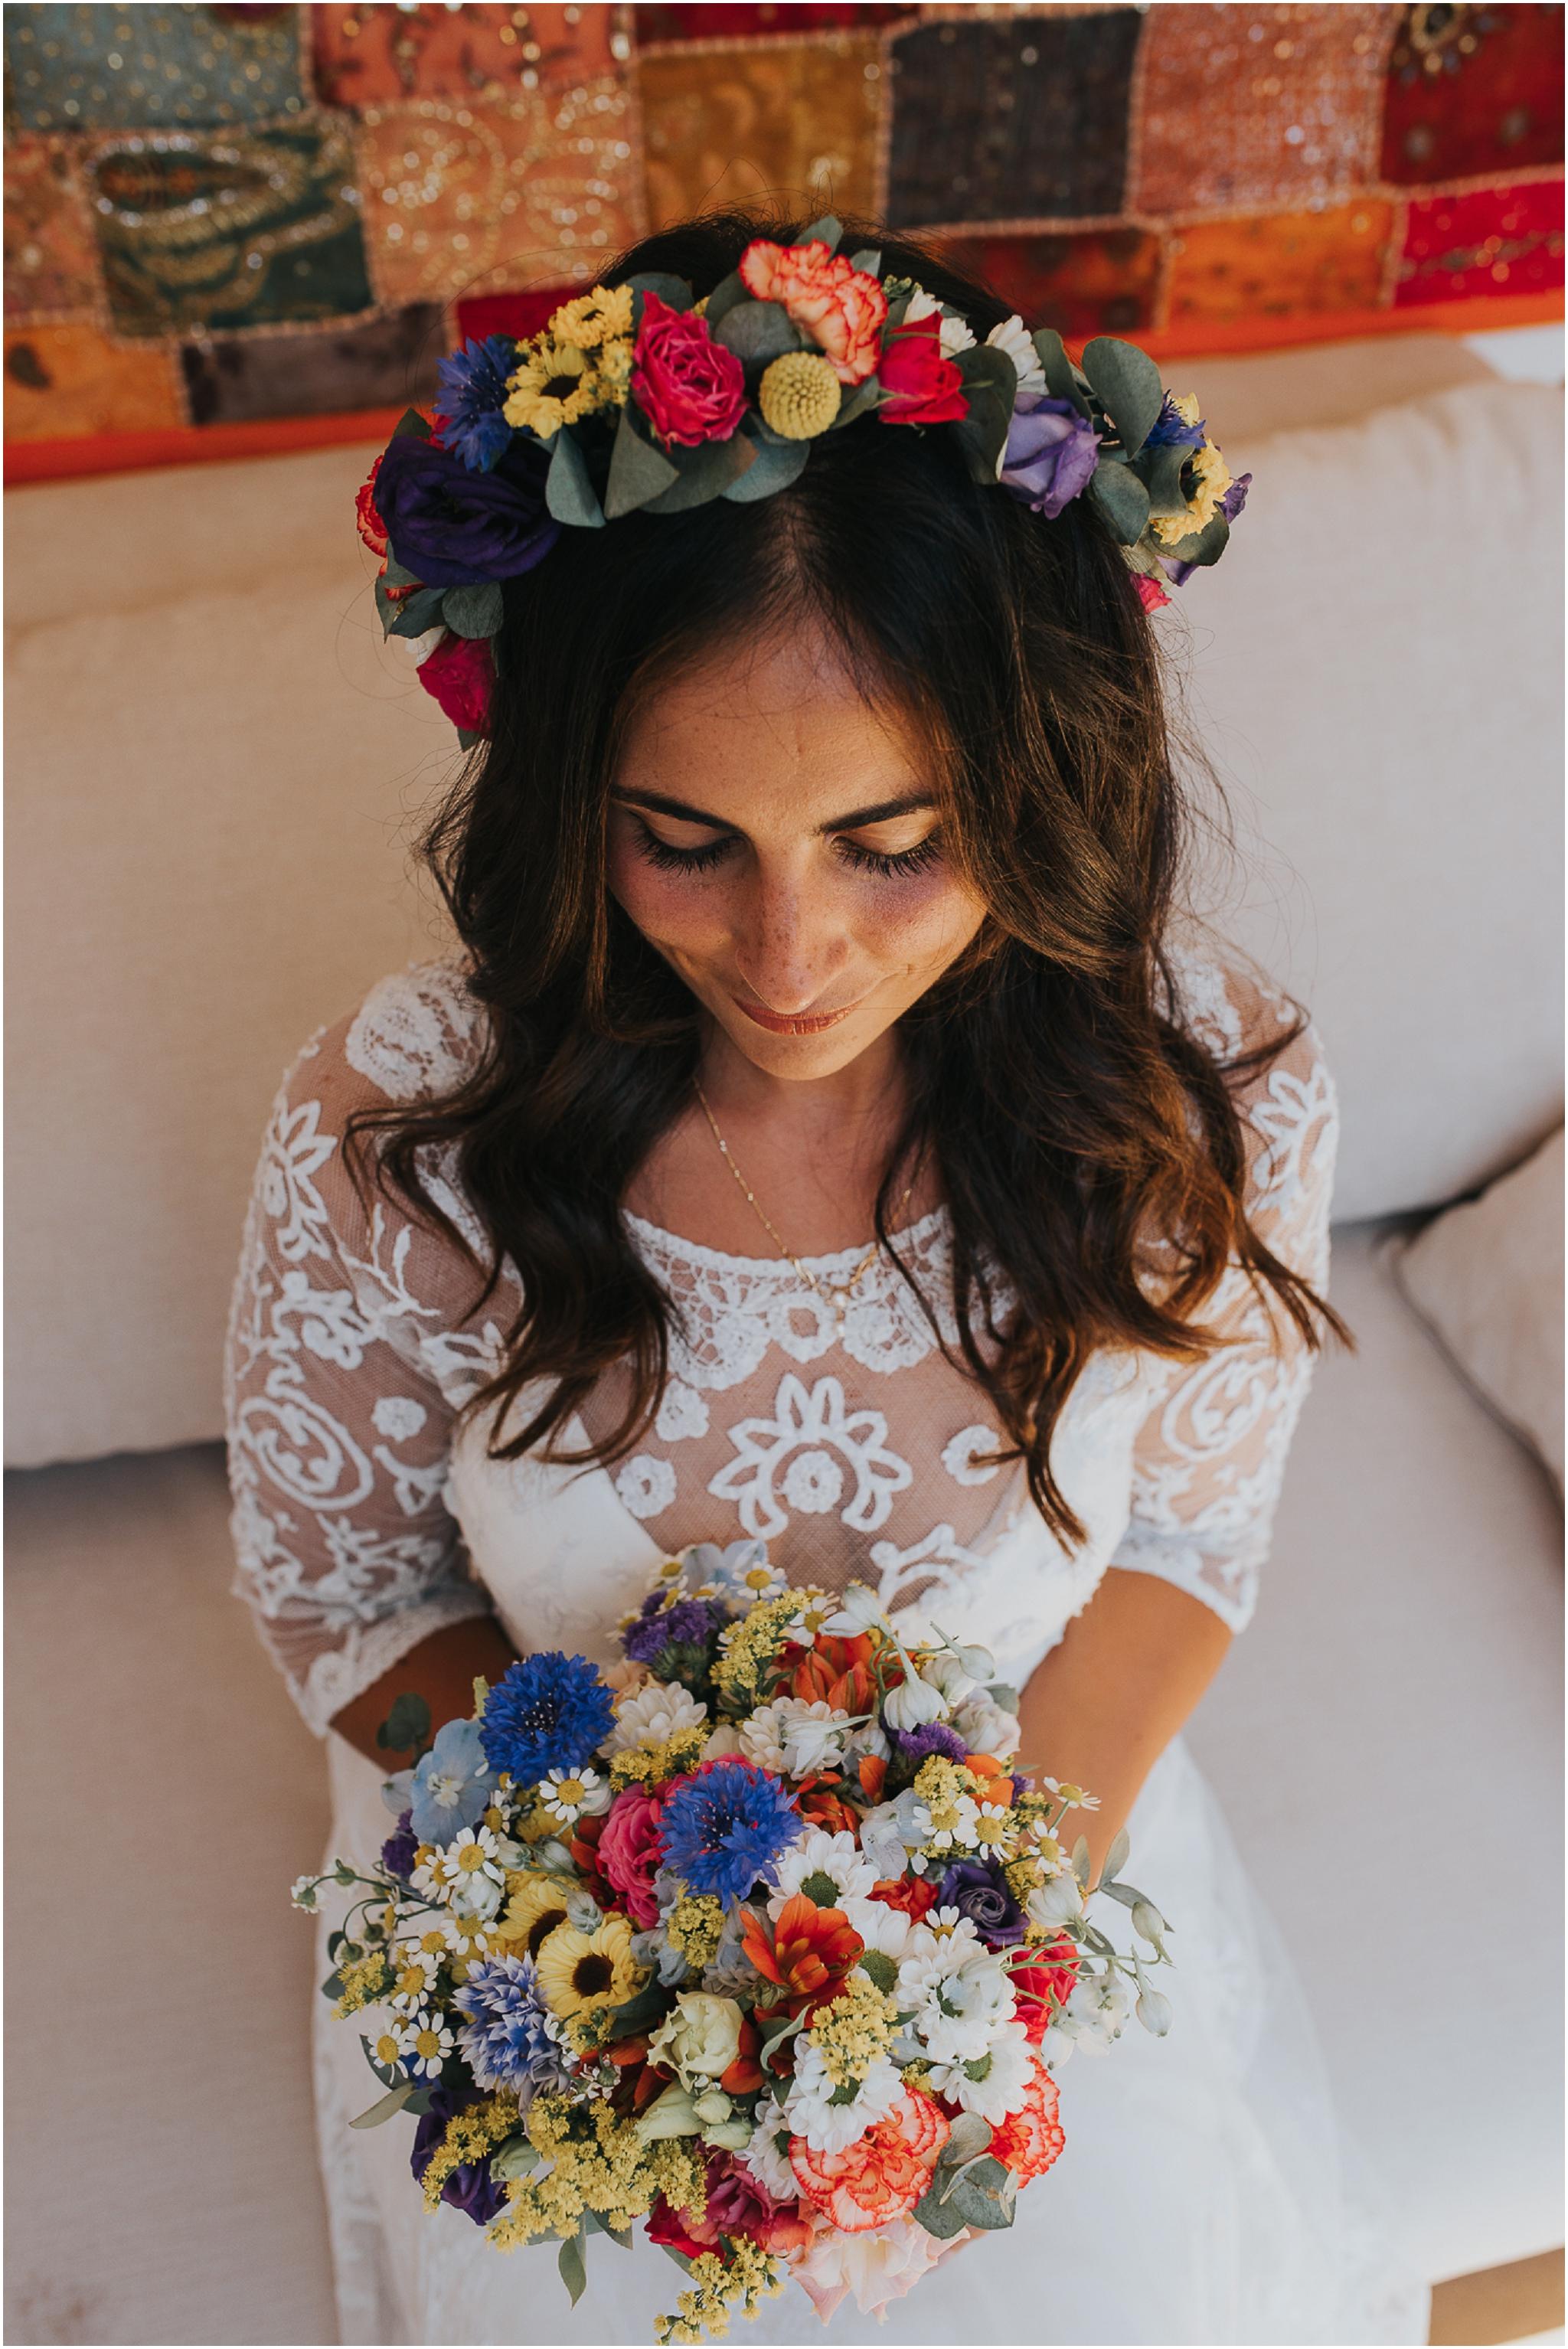 Manchester bride